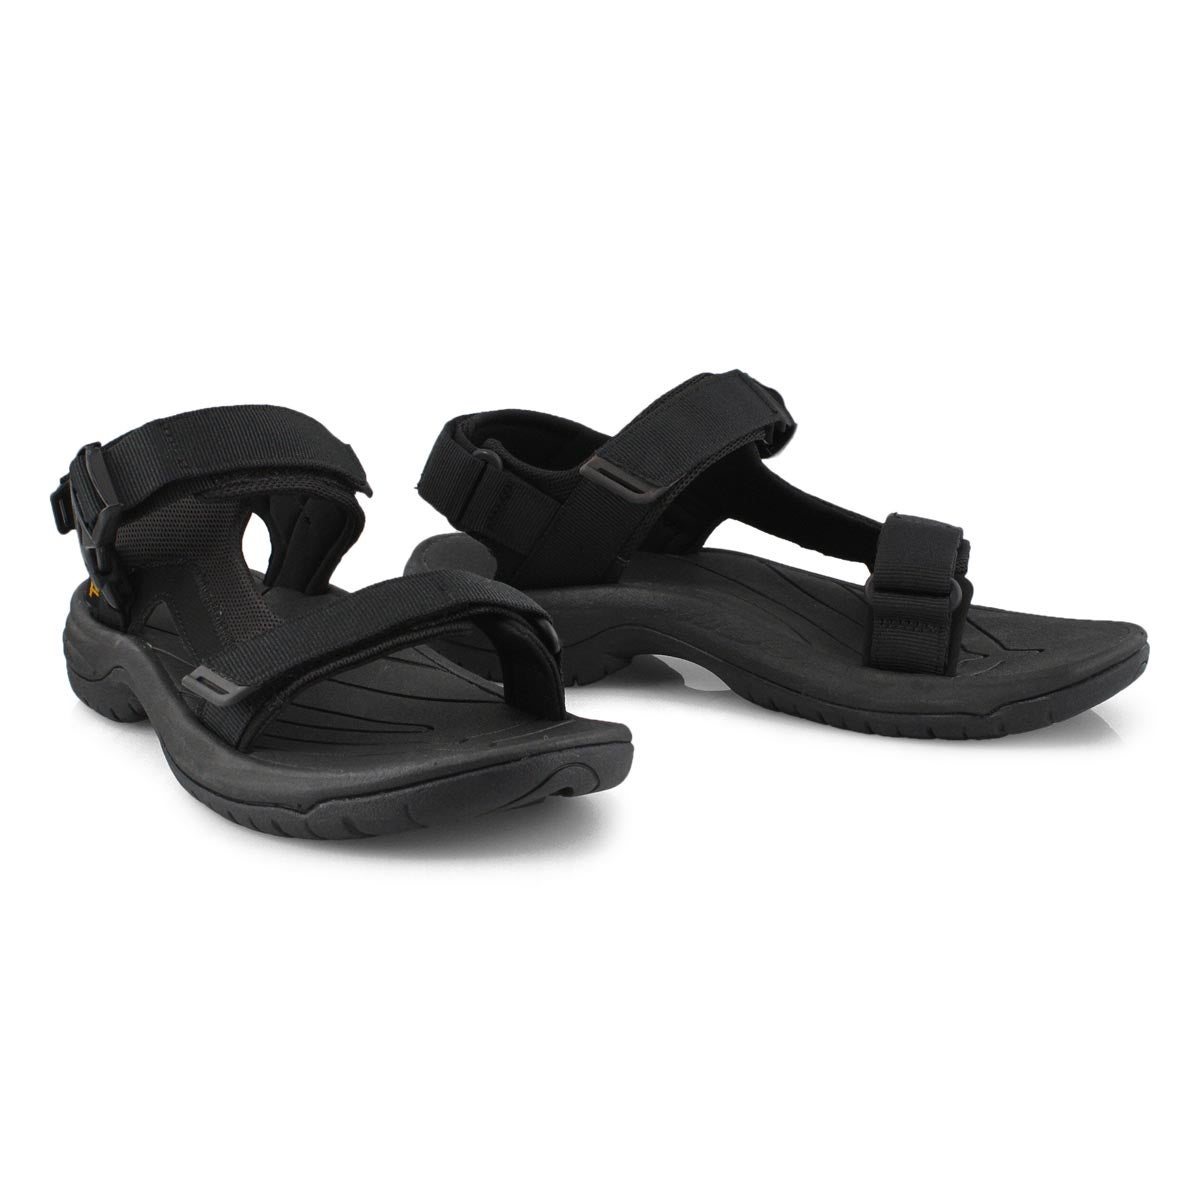 Mns Tanway black sport sandal